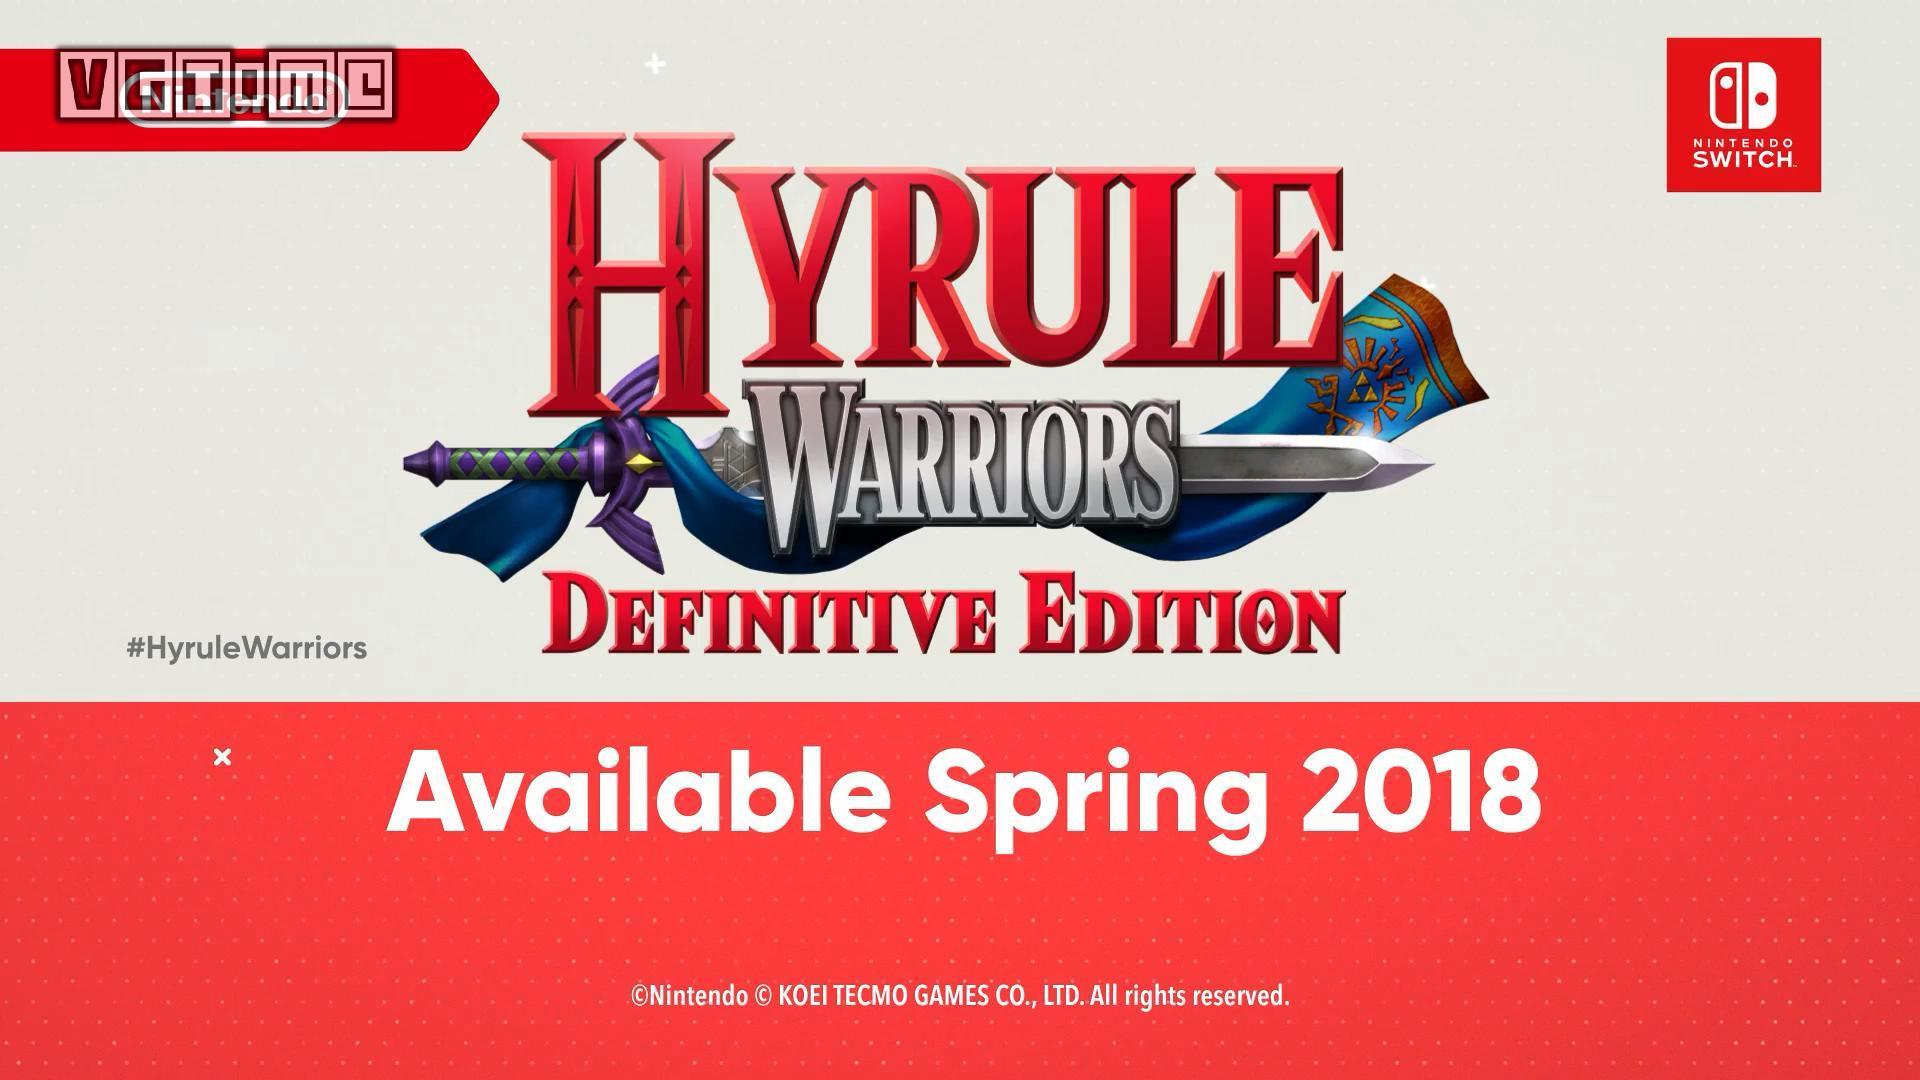 Switch版《塞尔达无双》正式公布 含全部DLC